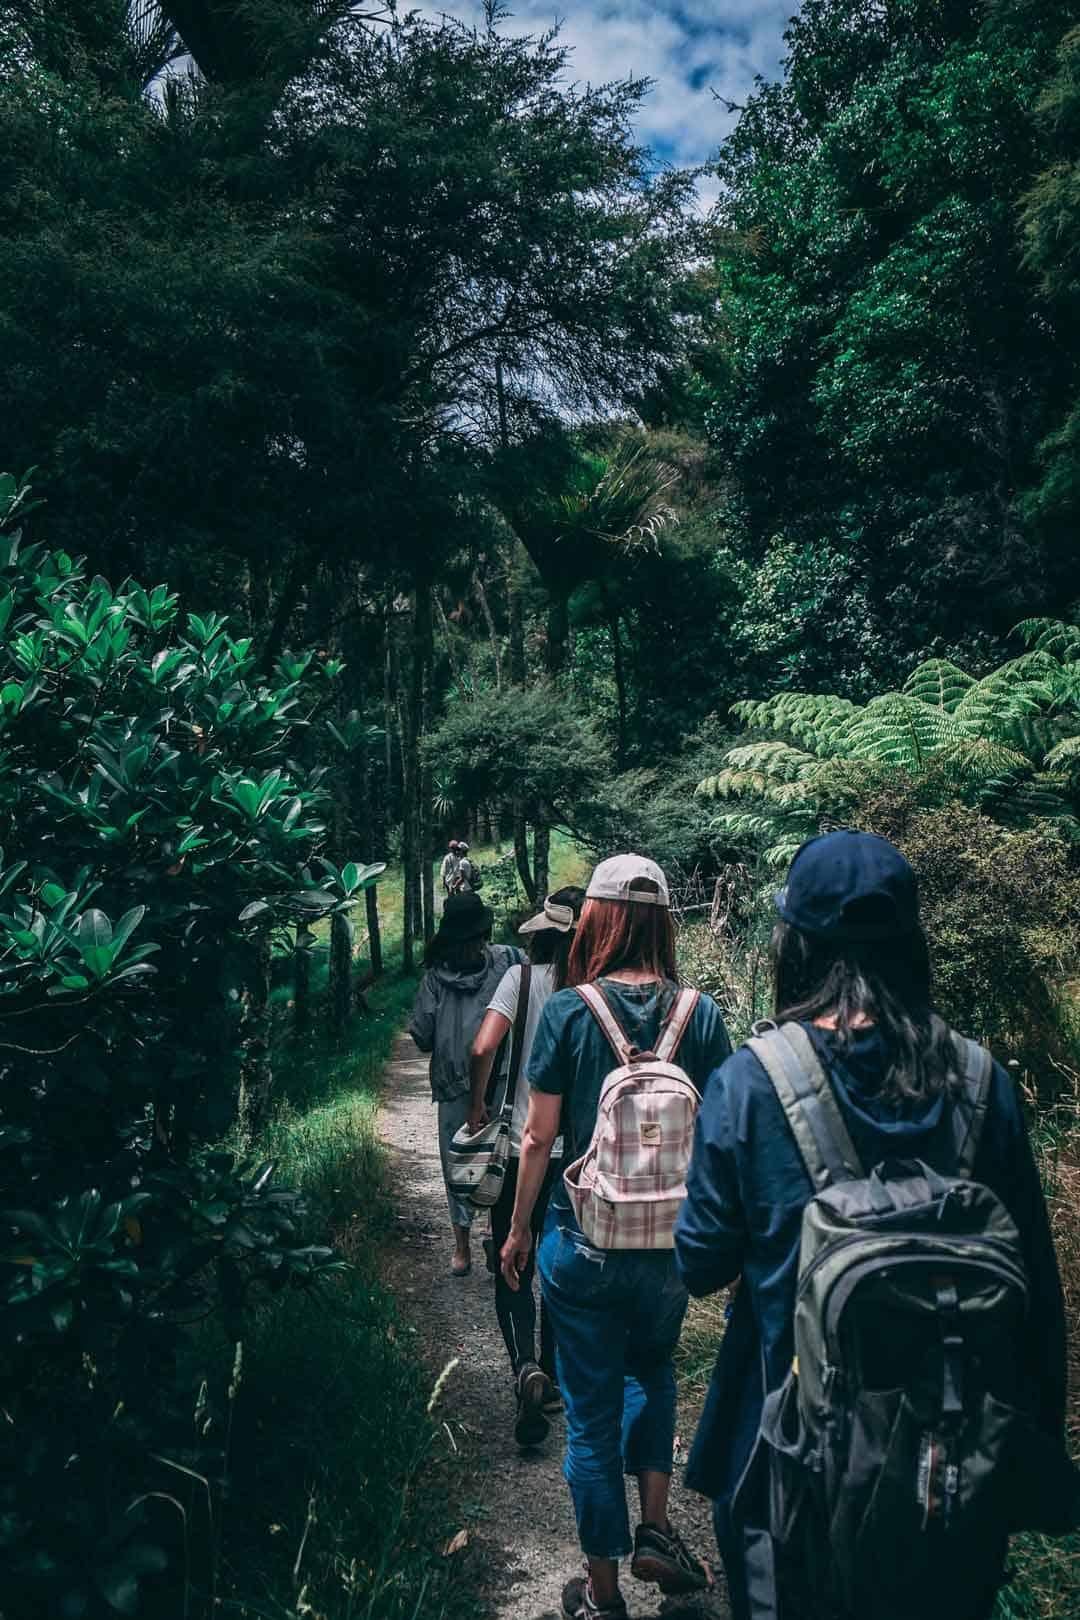 Rainforest, Trekking, Hiking